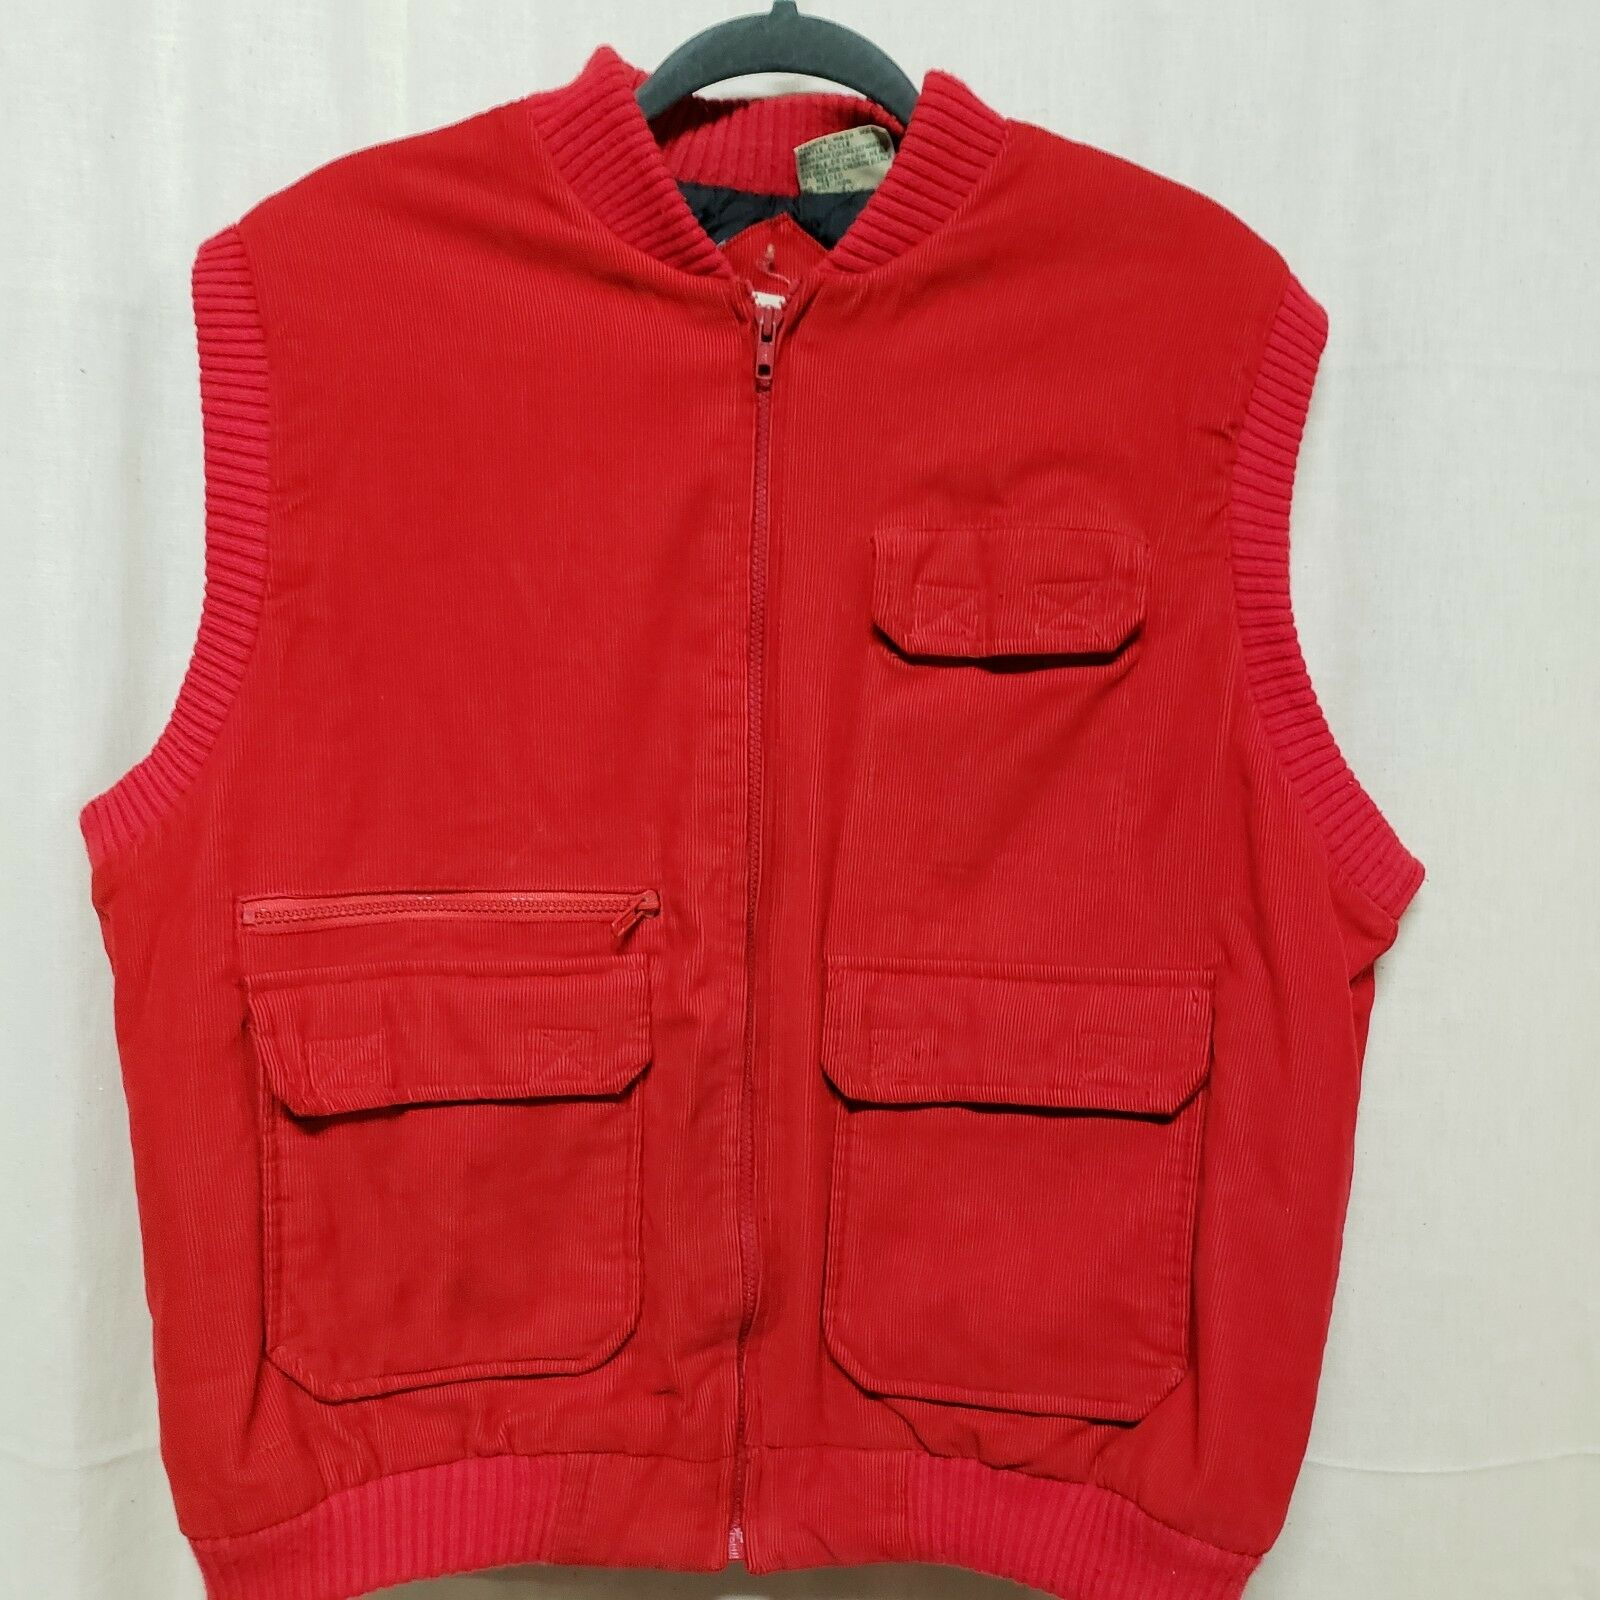 Vtg St John's Bay Mens Sz L Outdoors Vest Red Corduroy Full Zip Quilted Lining